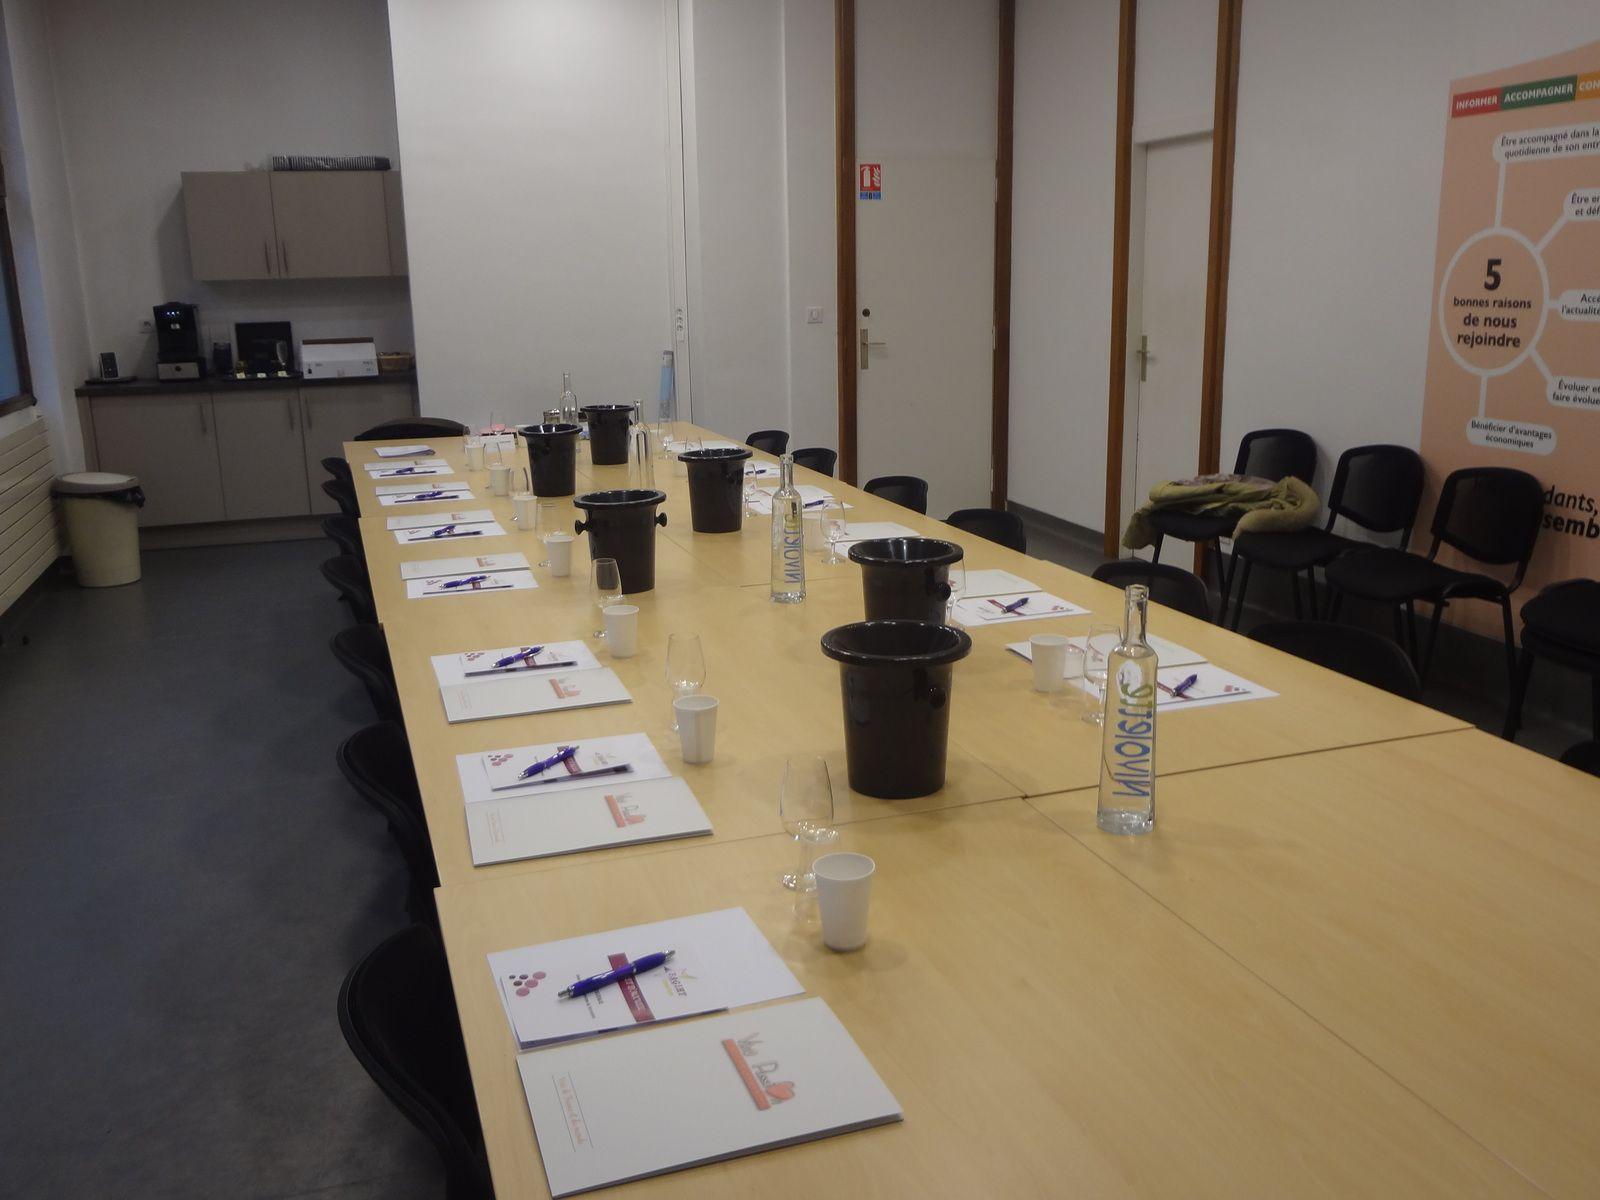 Formation professionnelle avec Fagiht formation à Chambéry